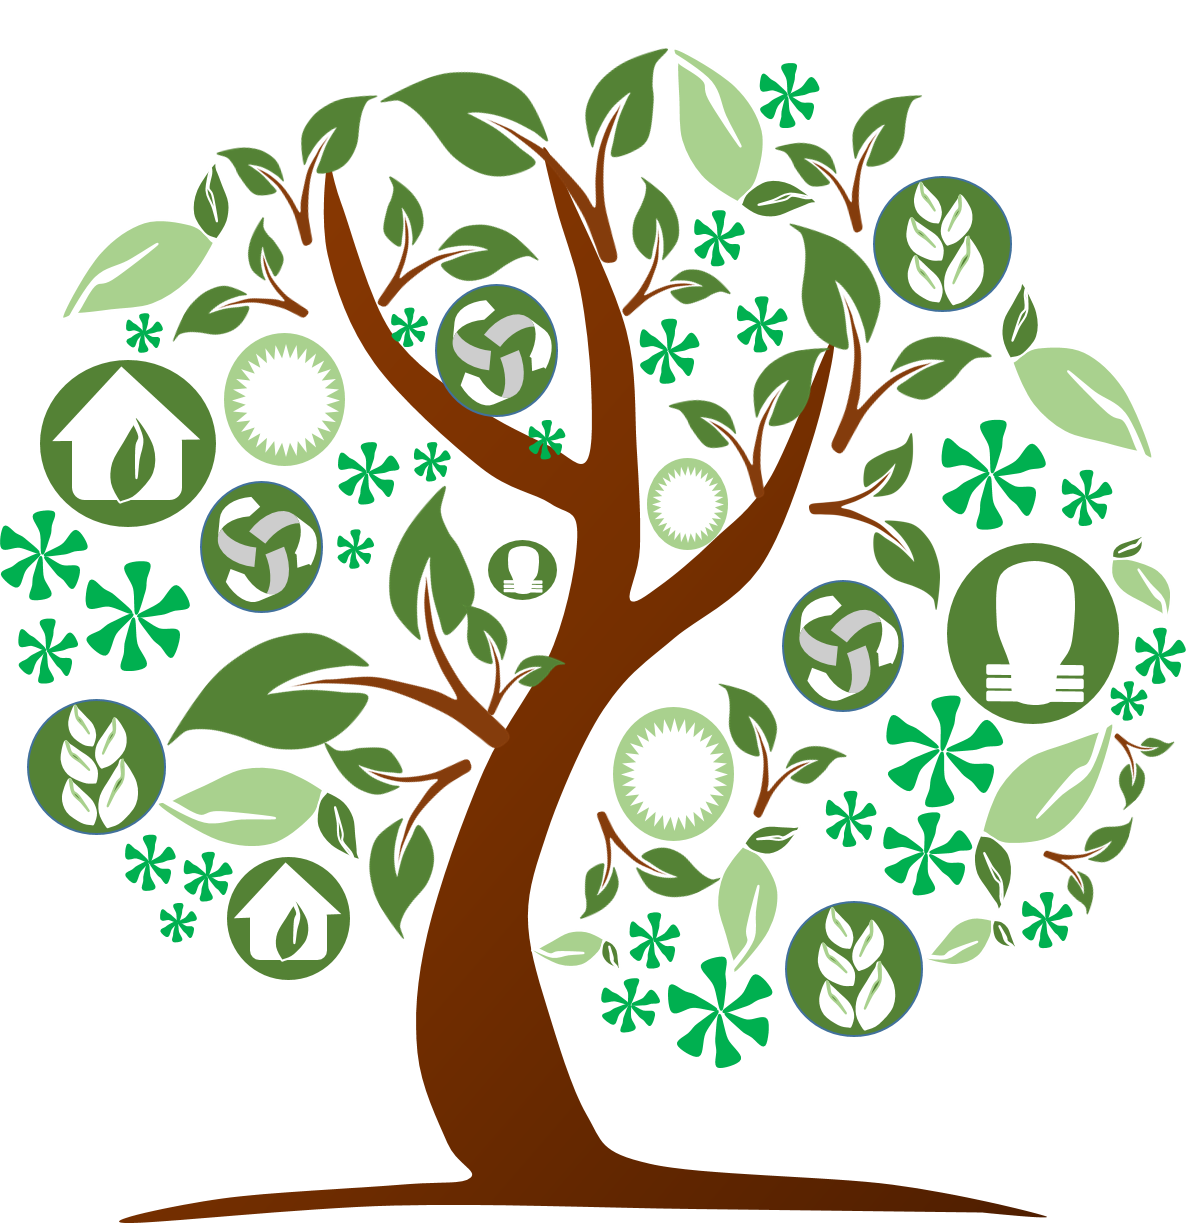 Clip art of world clipart image. Environment Logo